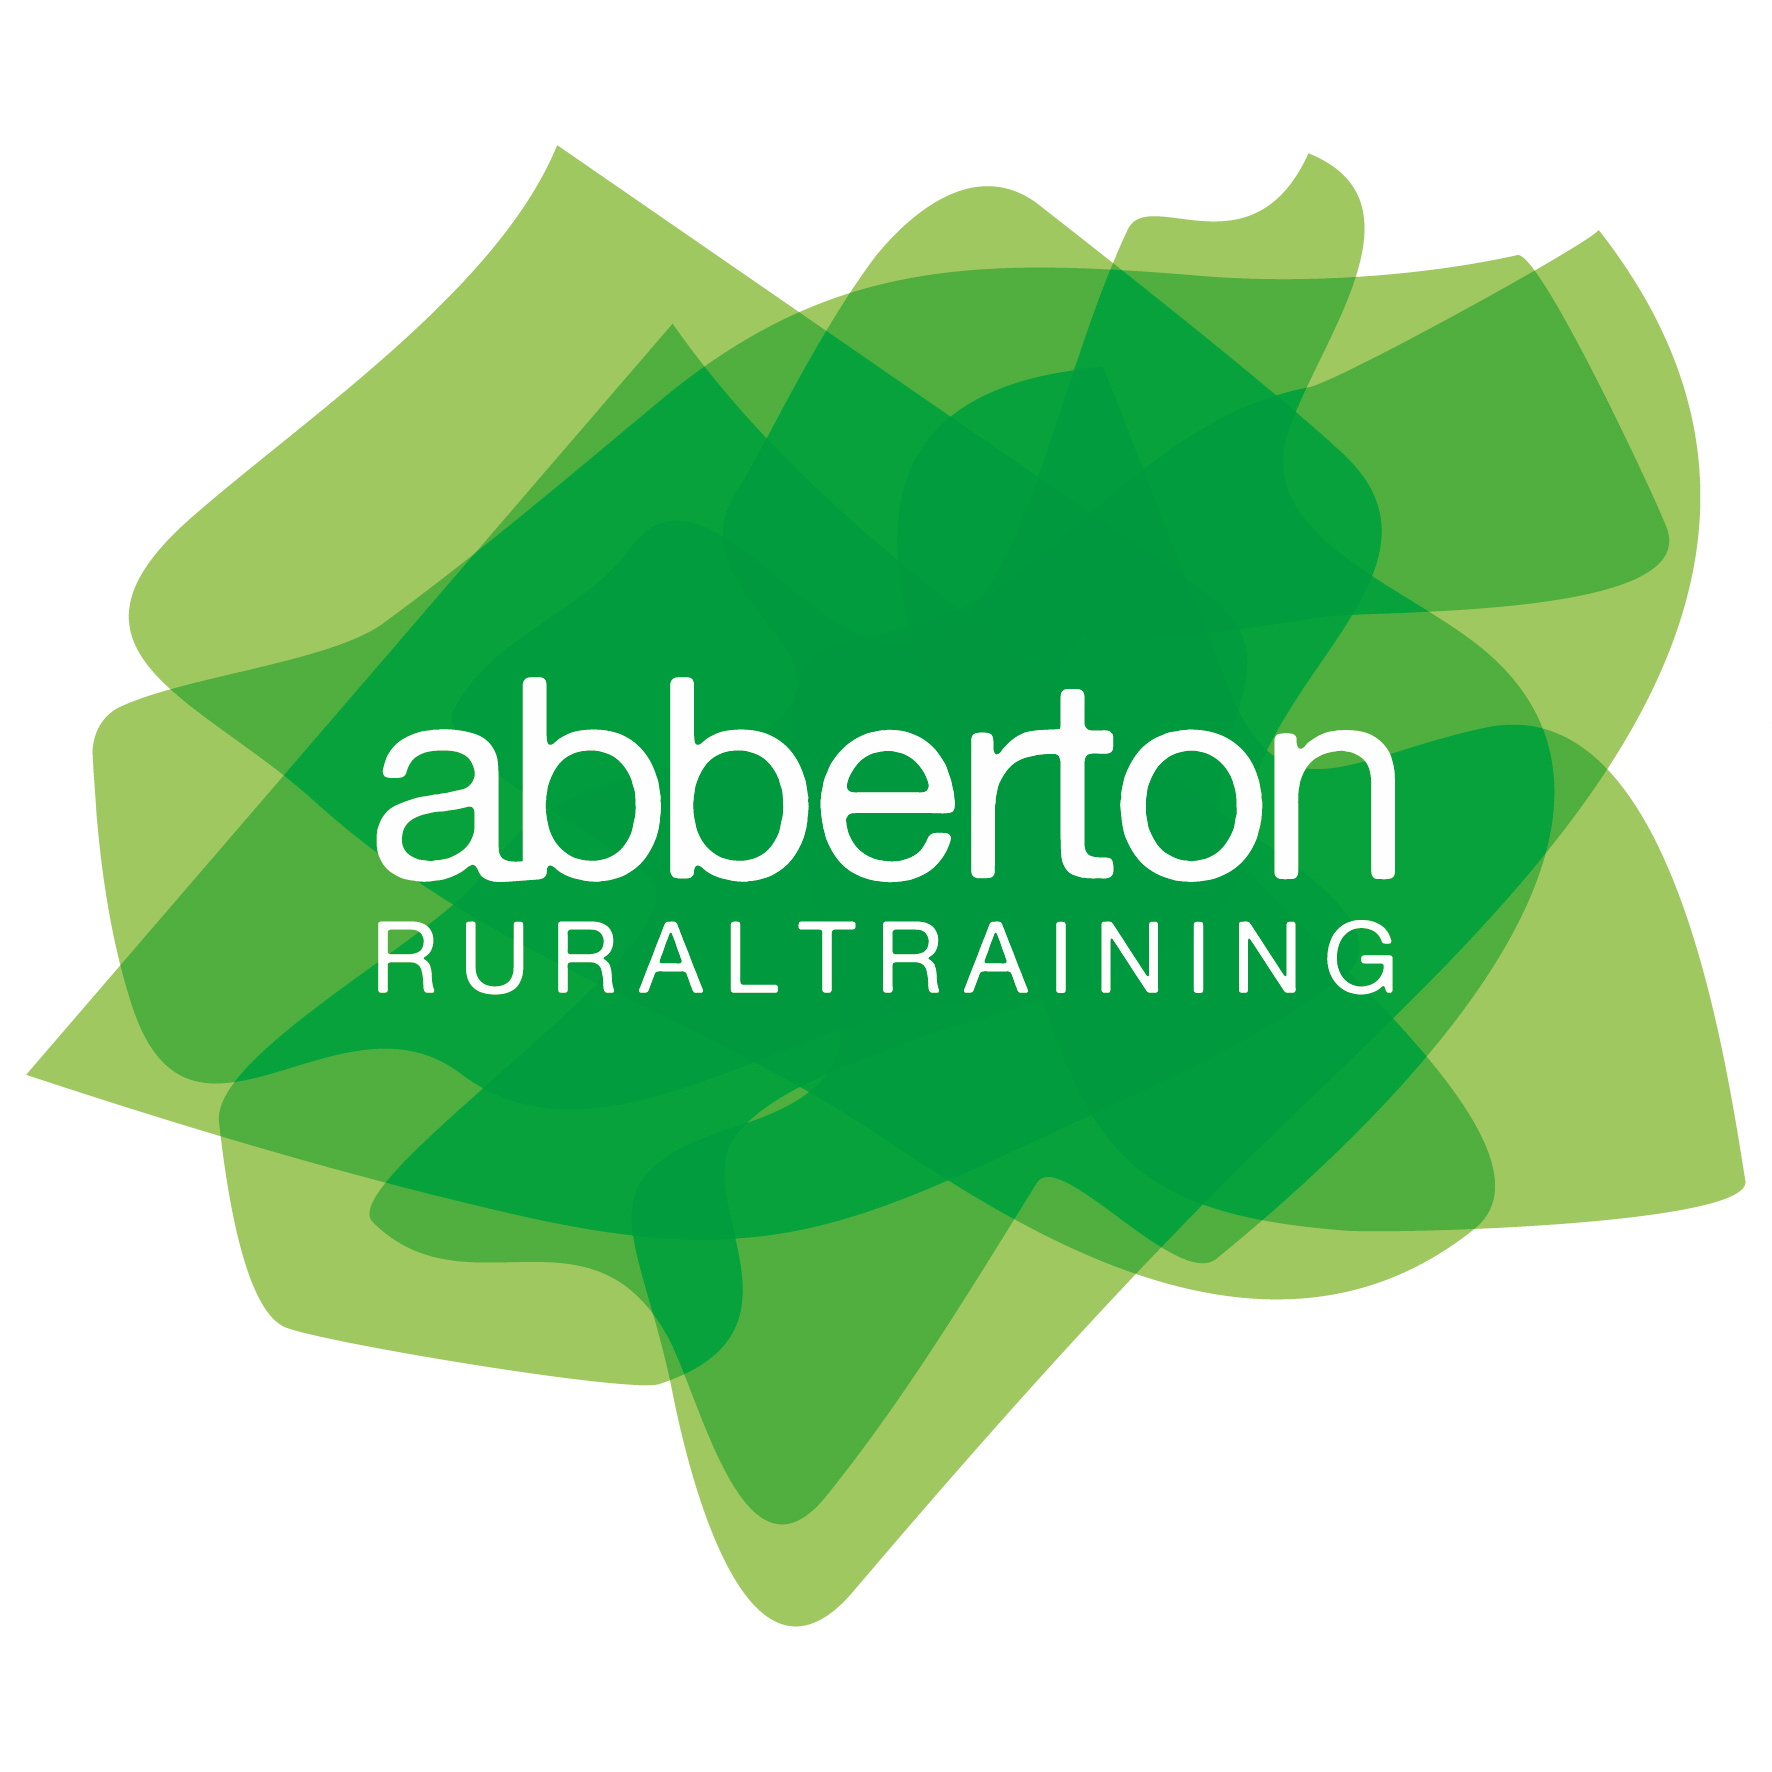 abberton-rural-training